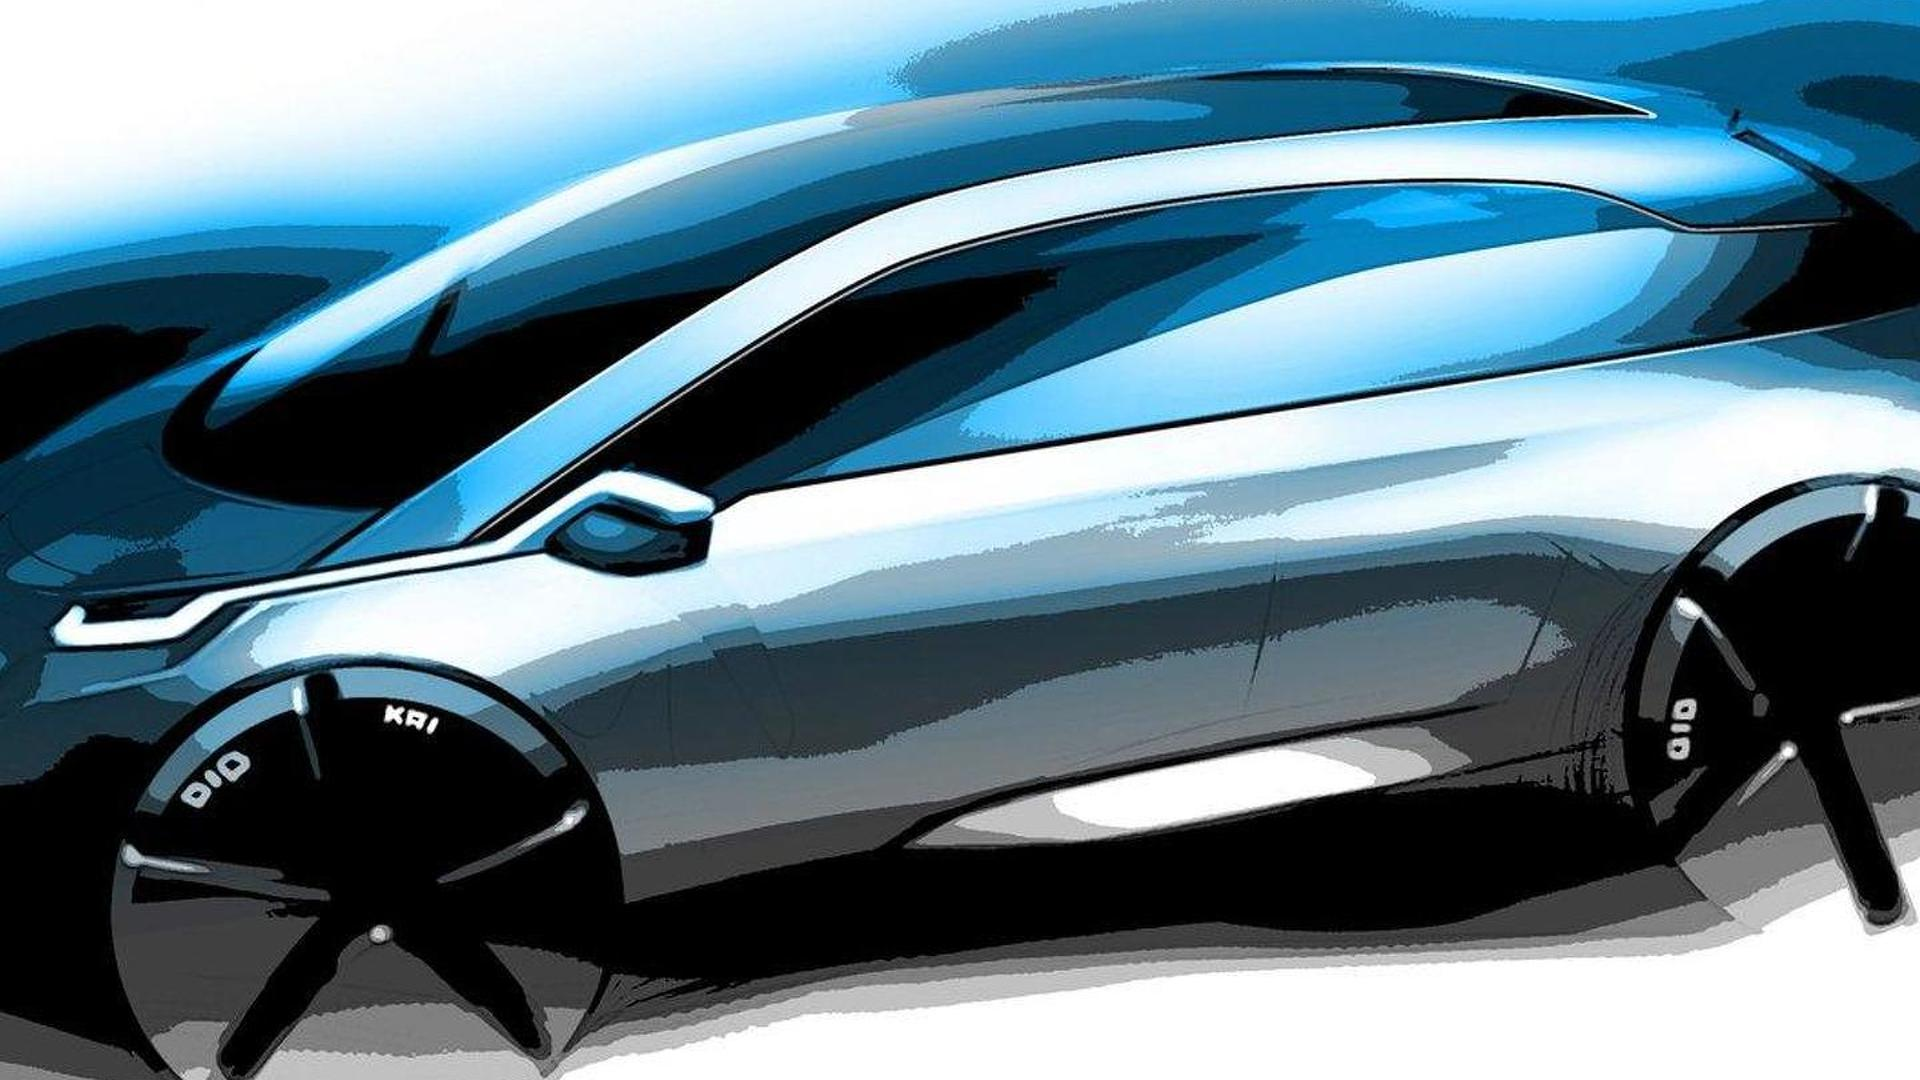 BMW Megacity further construction details